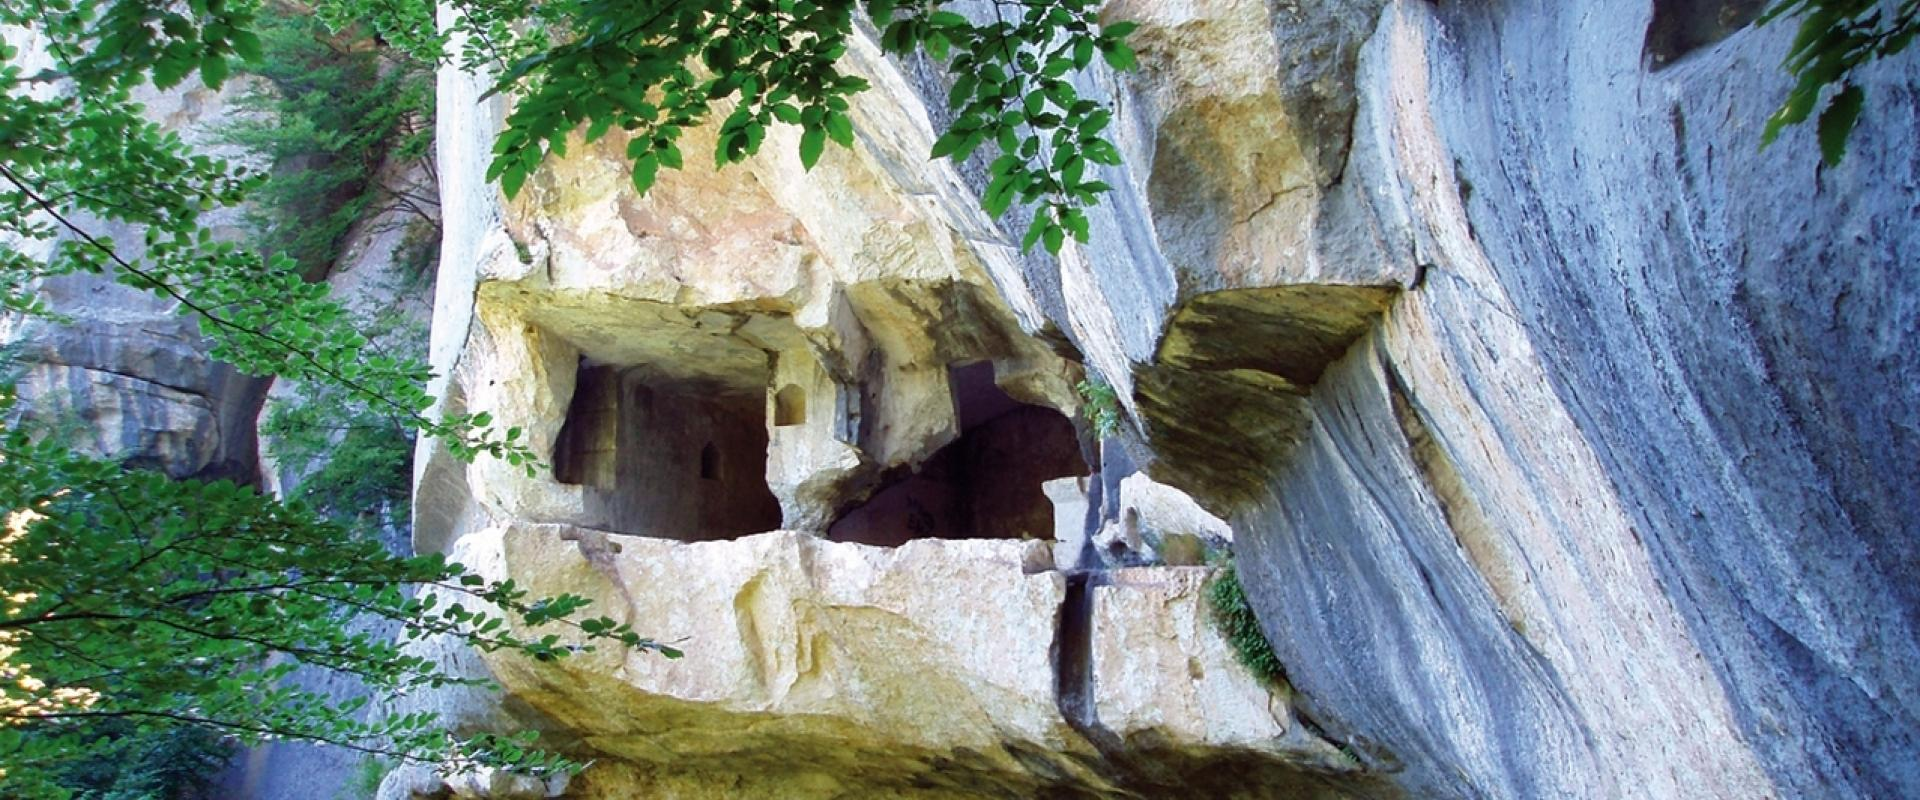 Visit of Caramanico Terme Abruzzo Majella's wonderworking waters!